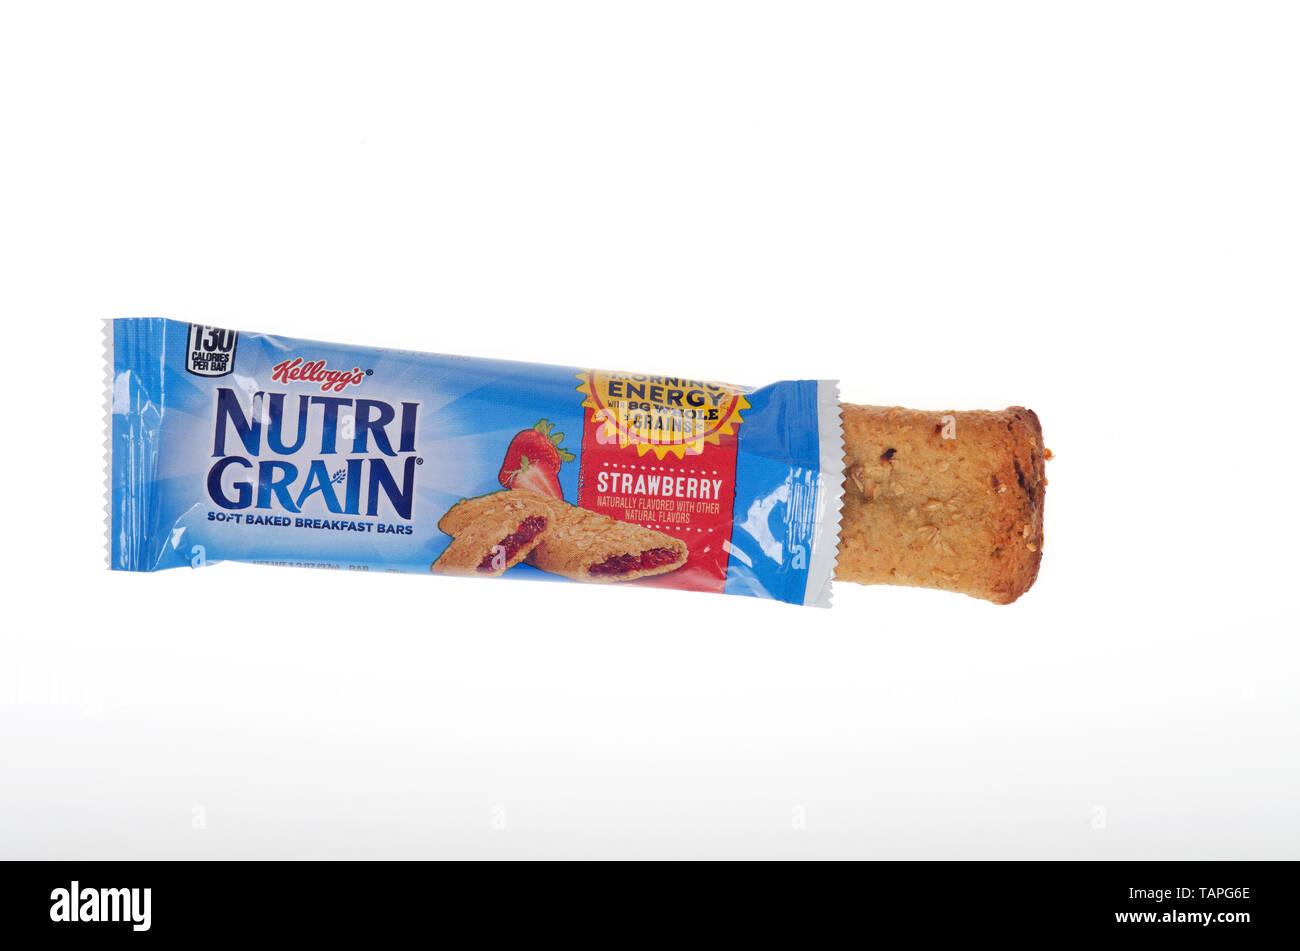 Kellogg's Nutri-grain breakfast bar - Stock Image